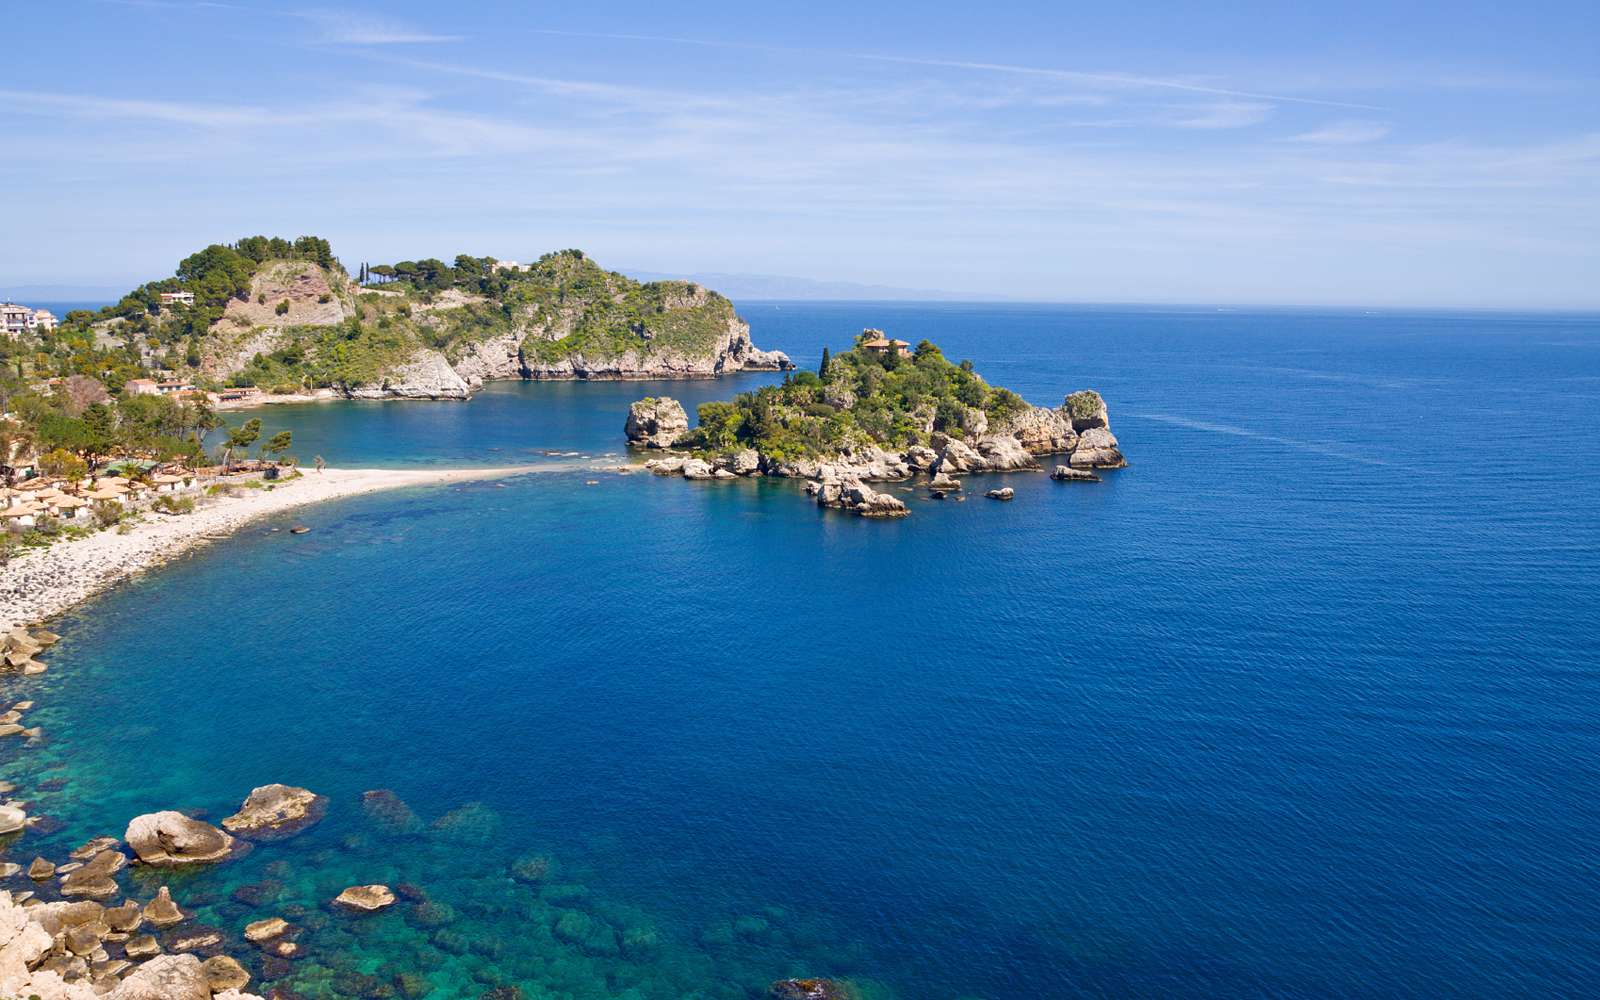 Isola-bella-in-Taormina,-Sicily--